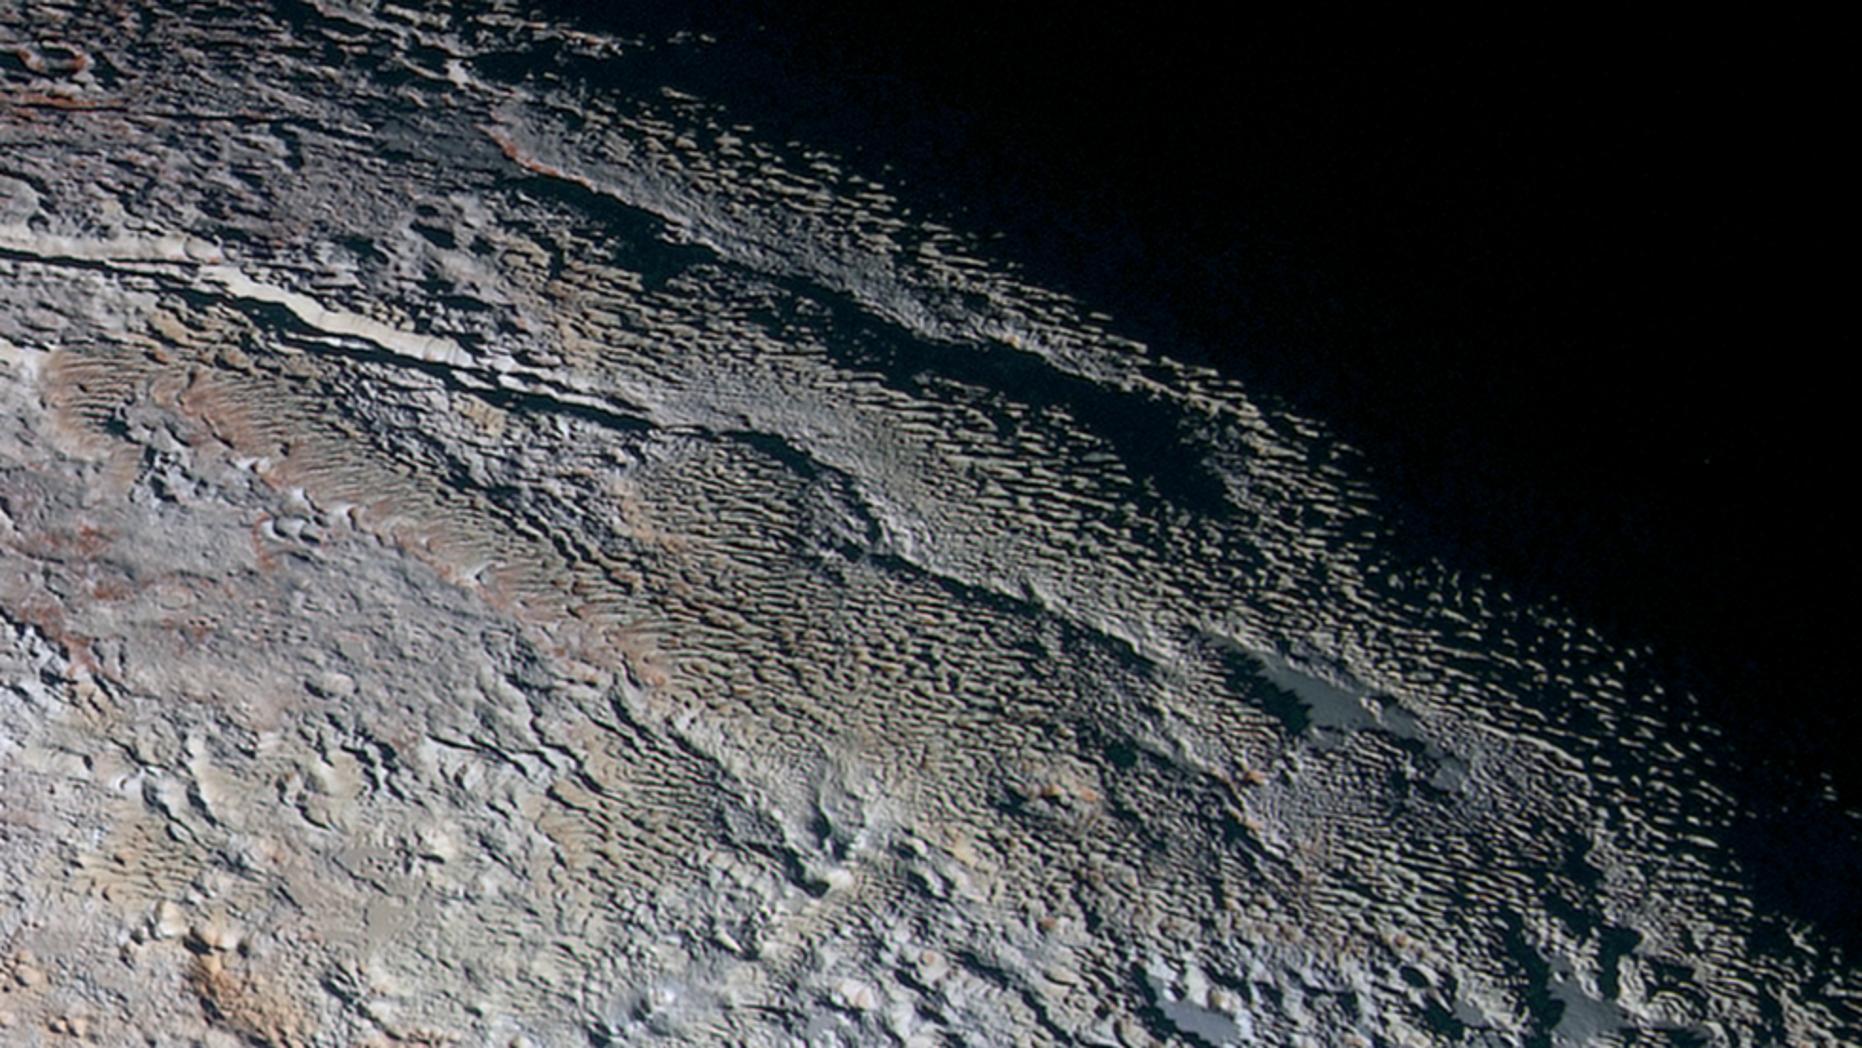 The bladed terrain of Pluto's informally named Tartarus Dorsa region, imaged by NASA's New Horizons spacecraft in July 2015. (Credits: NASA/JHUAPL/SwRI)